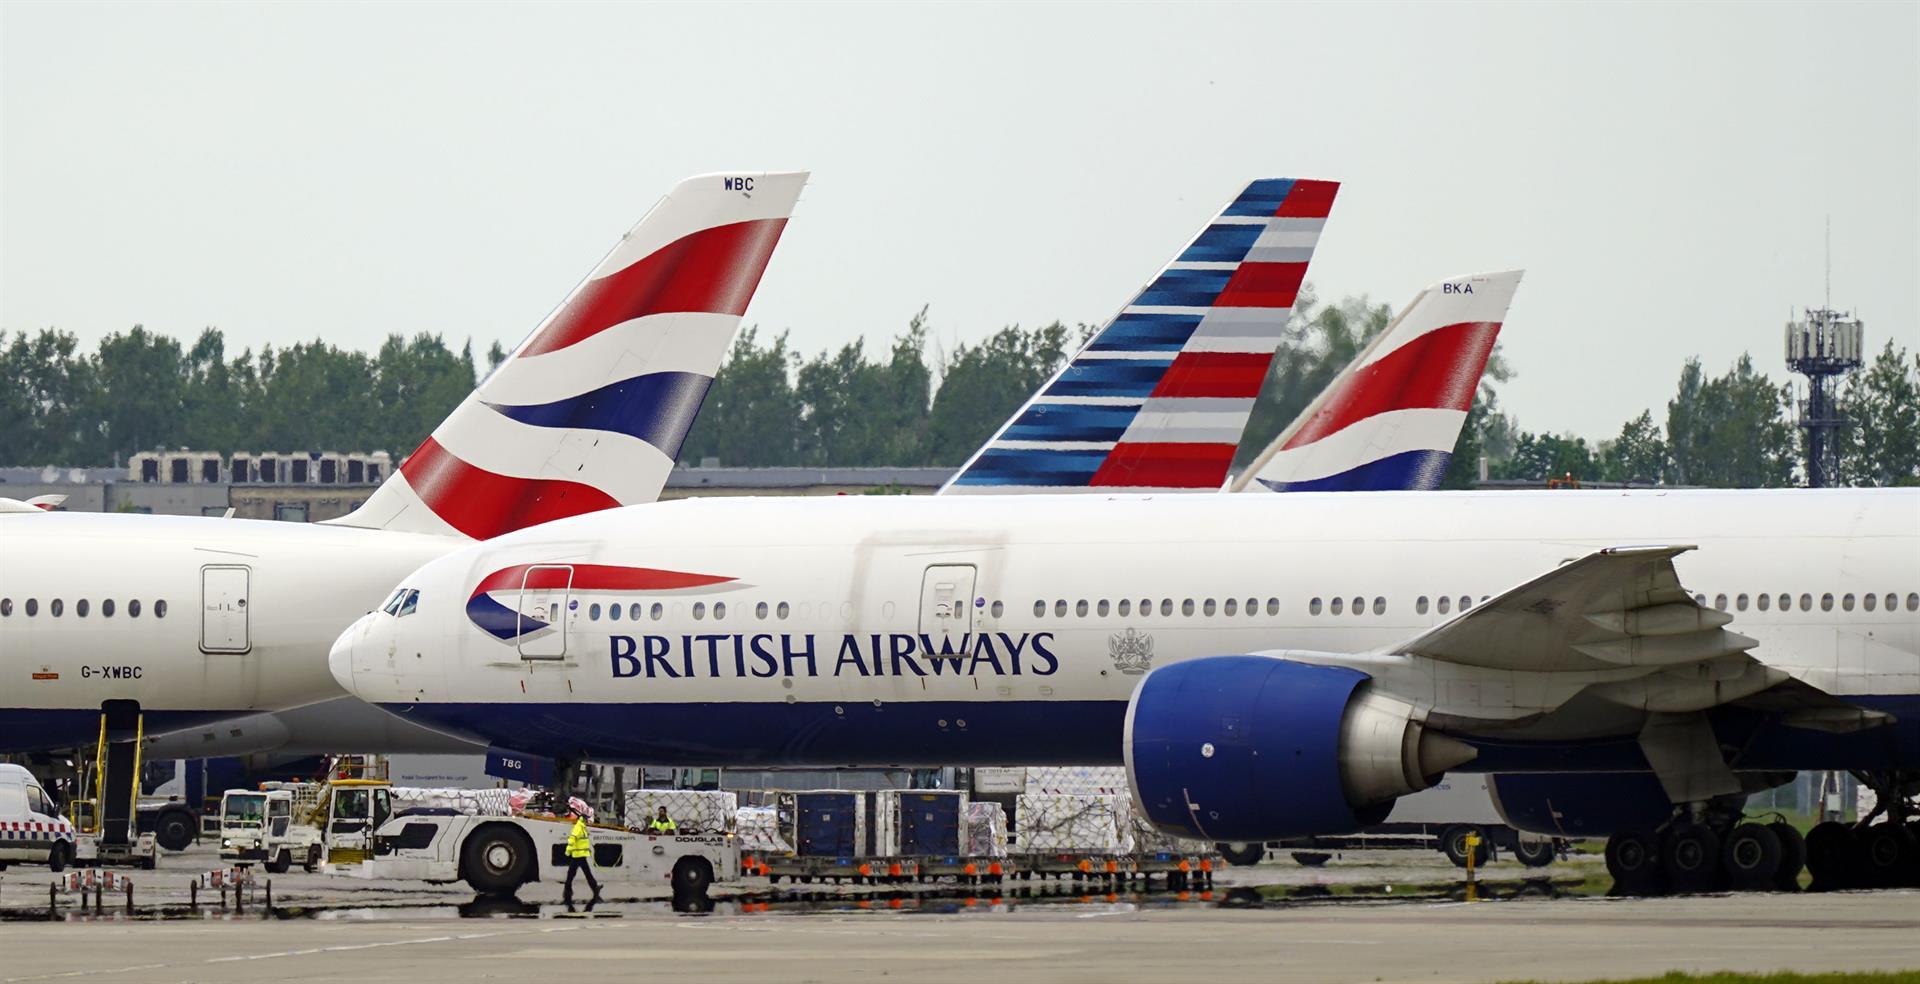 Reino Unido apela al «sentido común» para desaconsejar los viajes a países como España